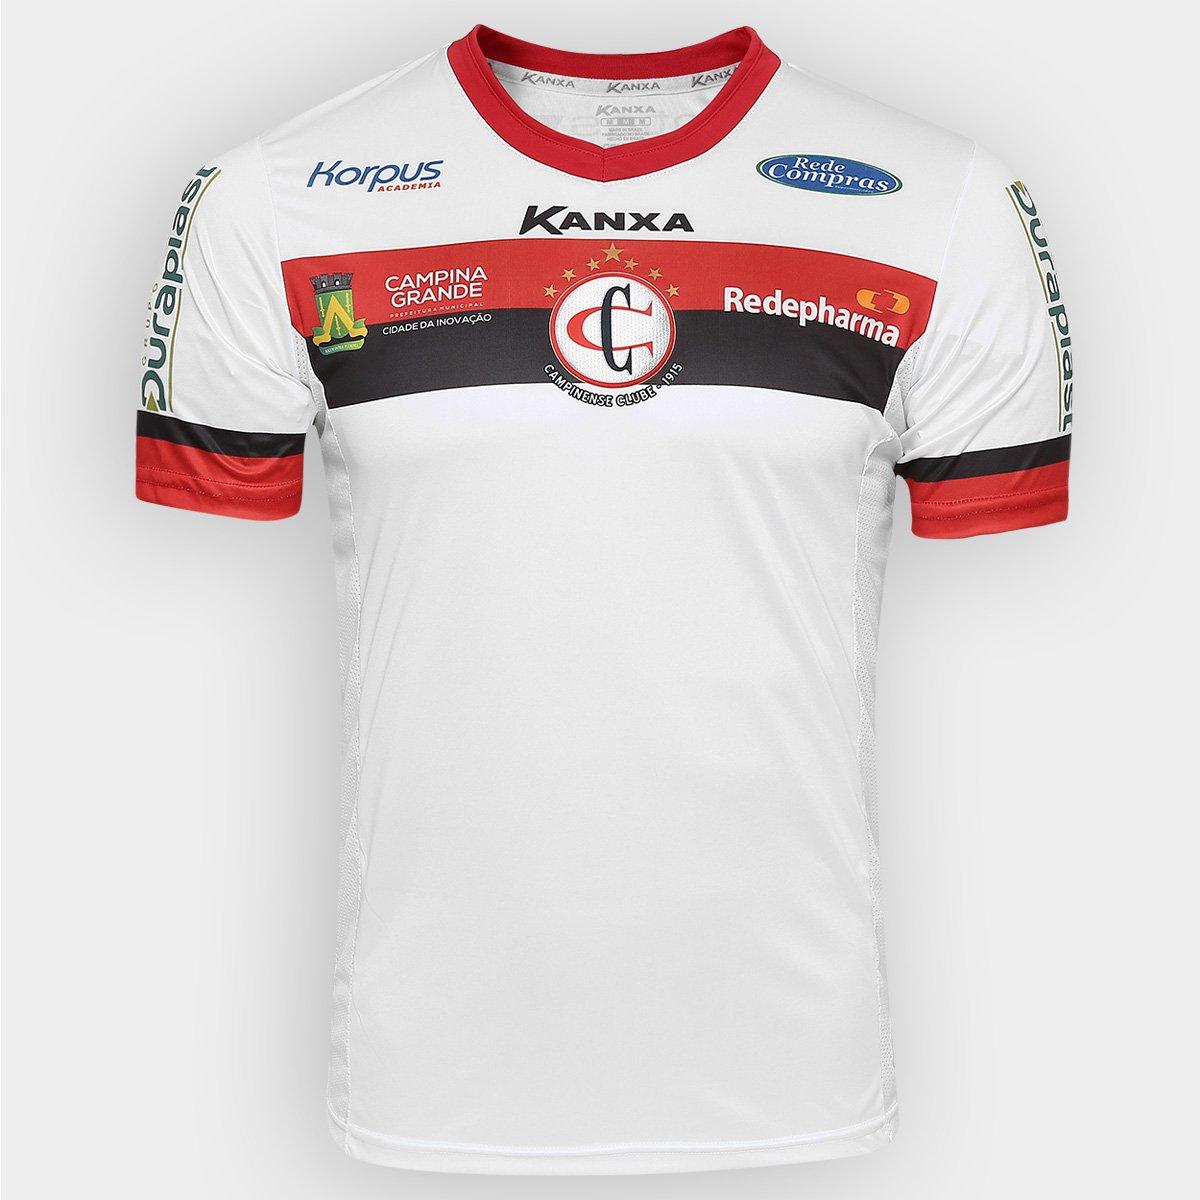 29d78b0f4 Camisa Kanxa Campinense II 2016 nº 10 | Netshoes